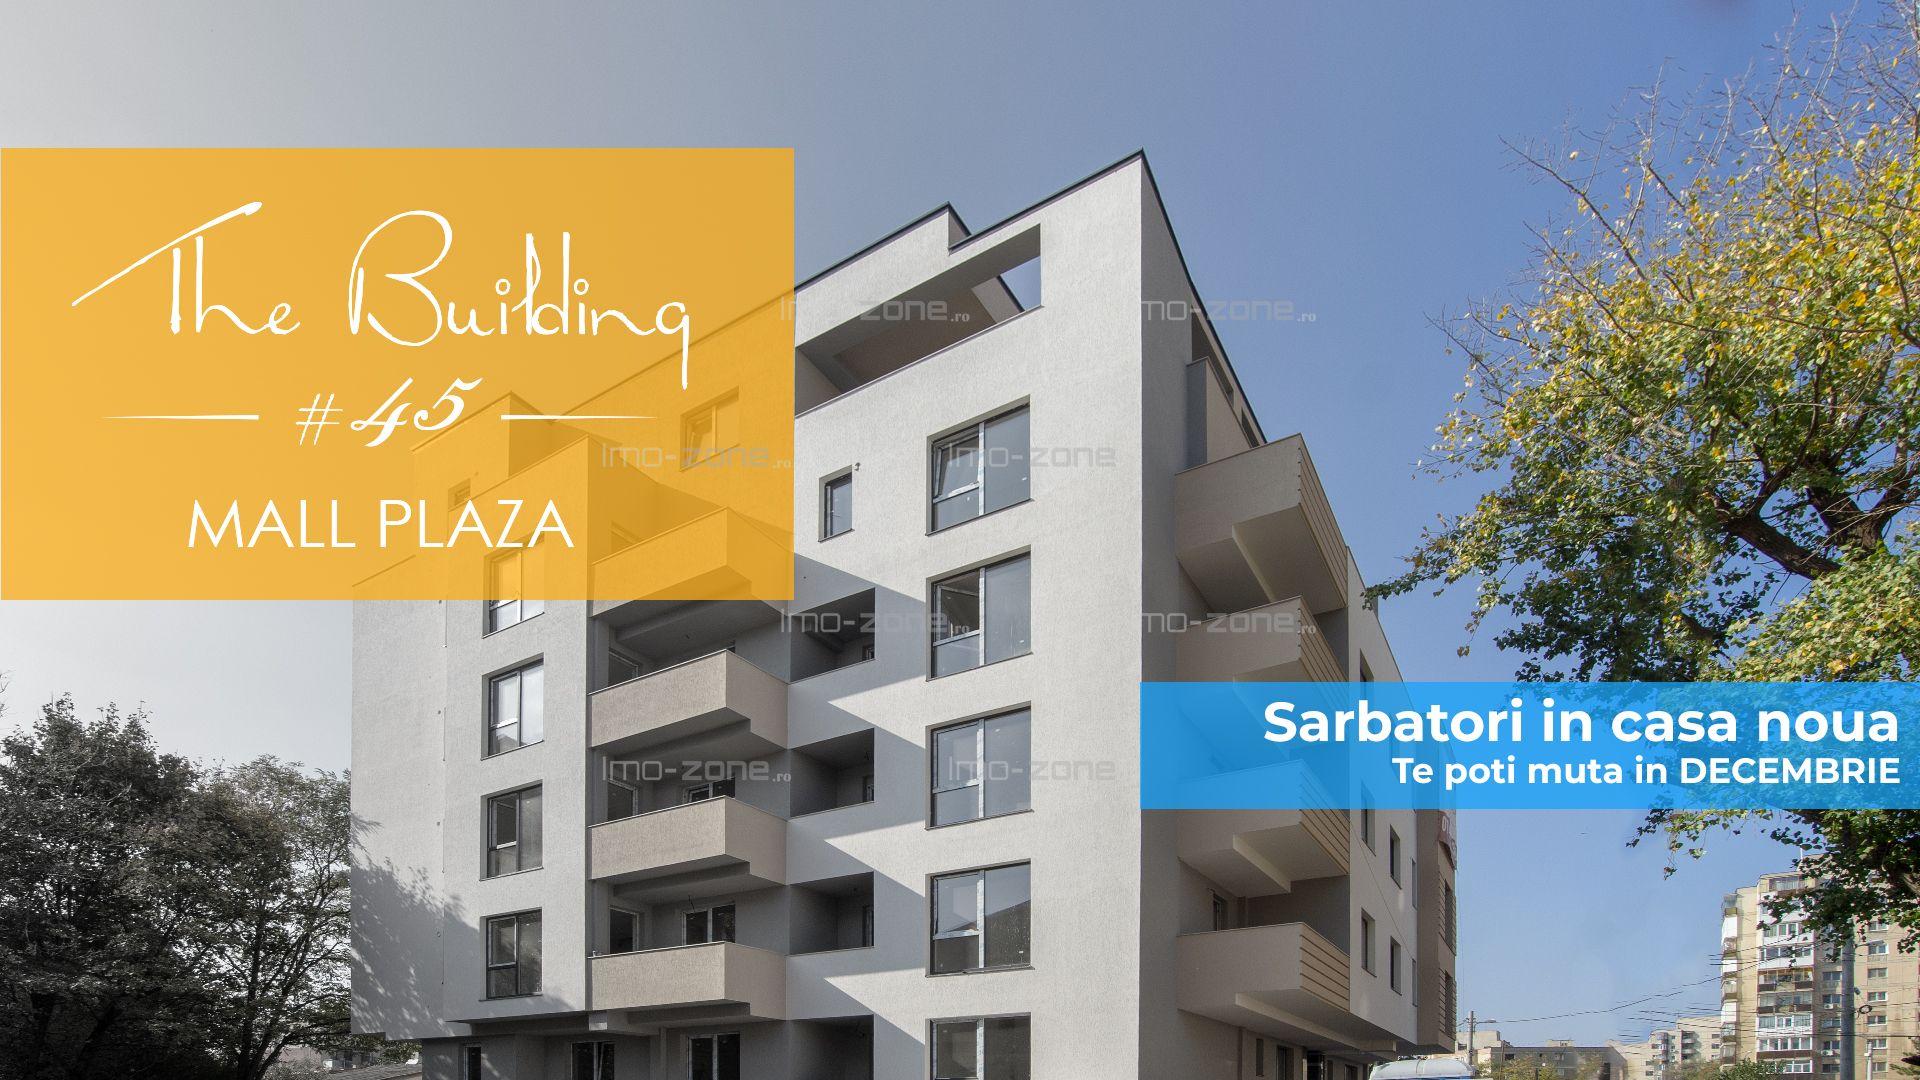 Apartament de 3 camere cu terasa, 2 bai, bucatarie inchisa, PLAZA MALL